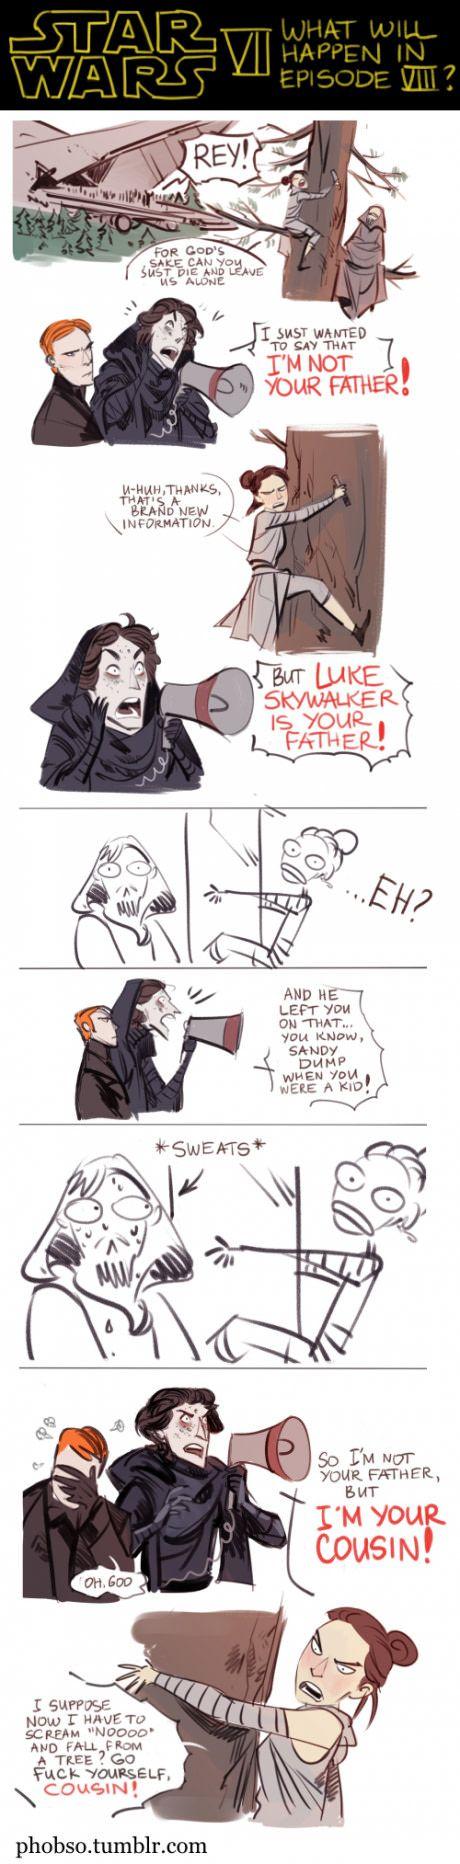 Star Wars, what will happen in Episode VIII?